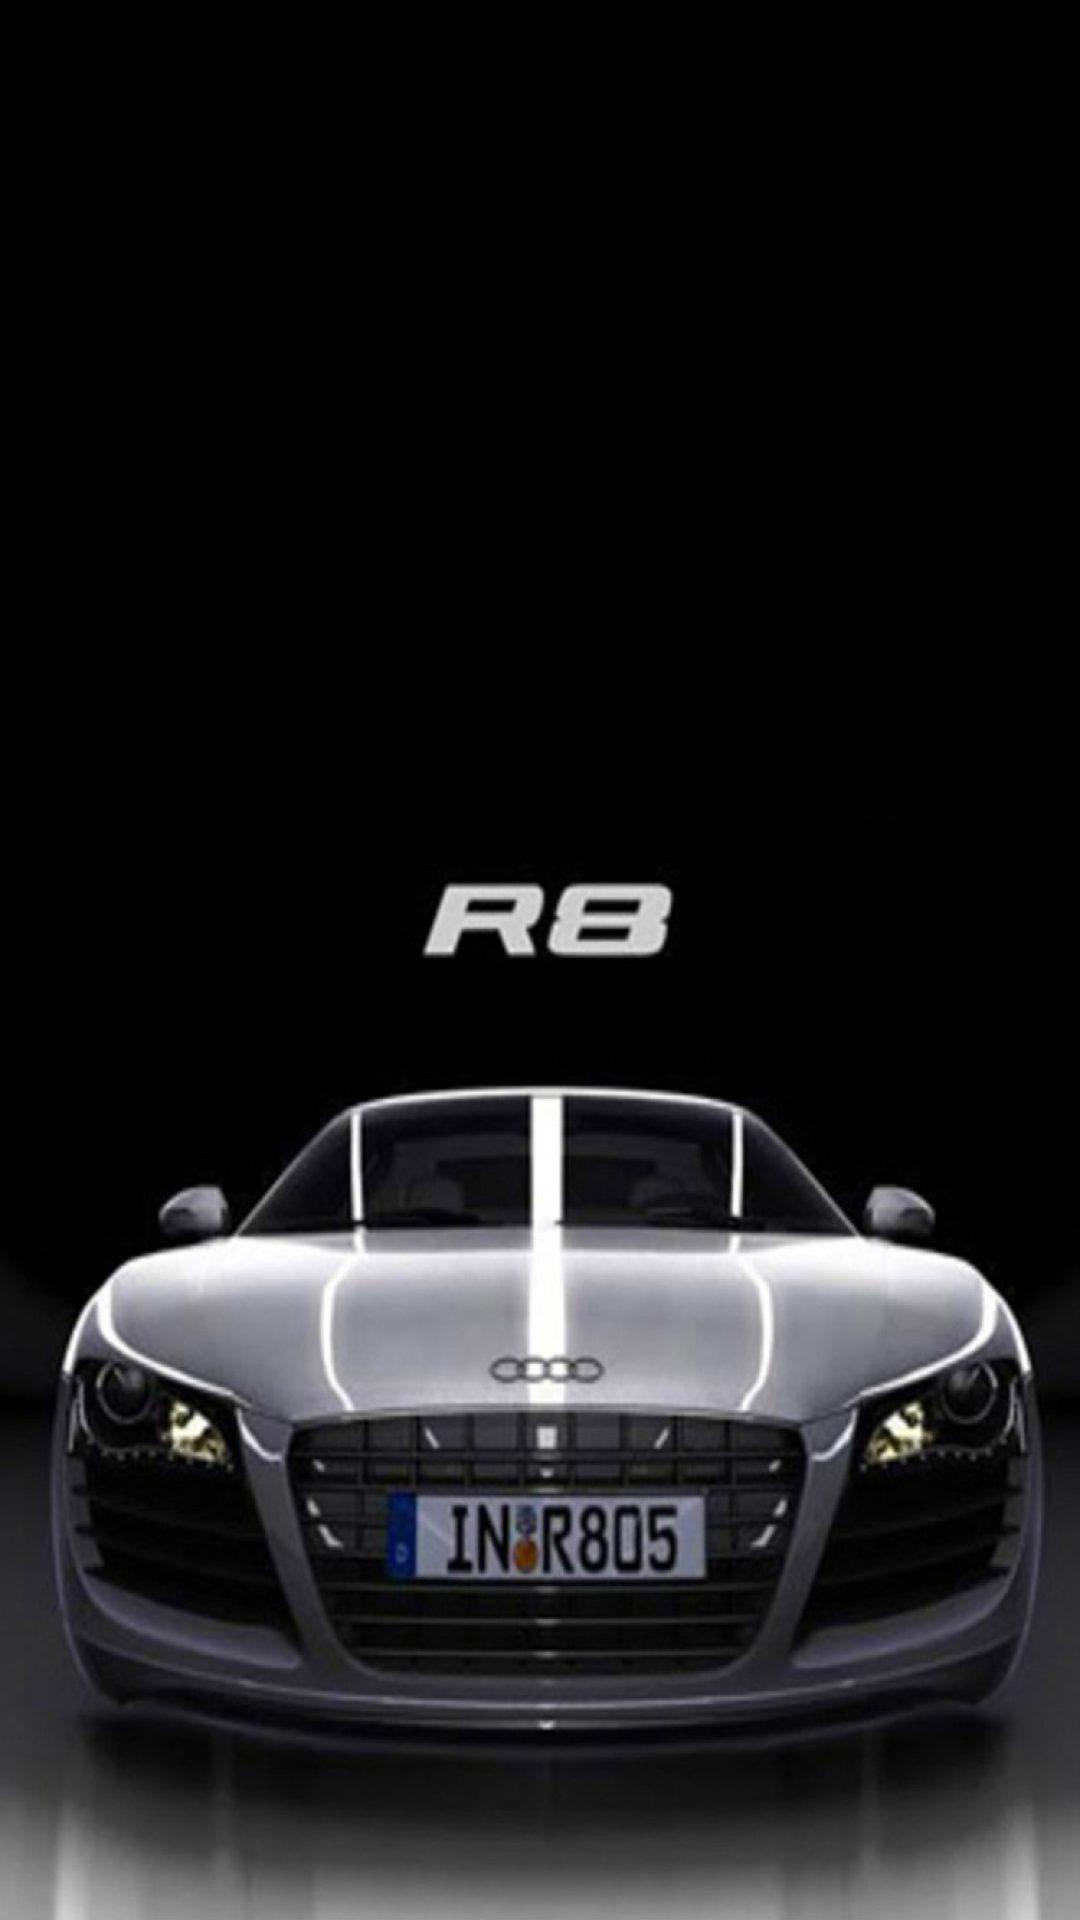 Cars iPhone Wallpaper